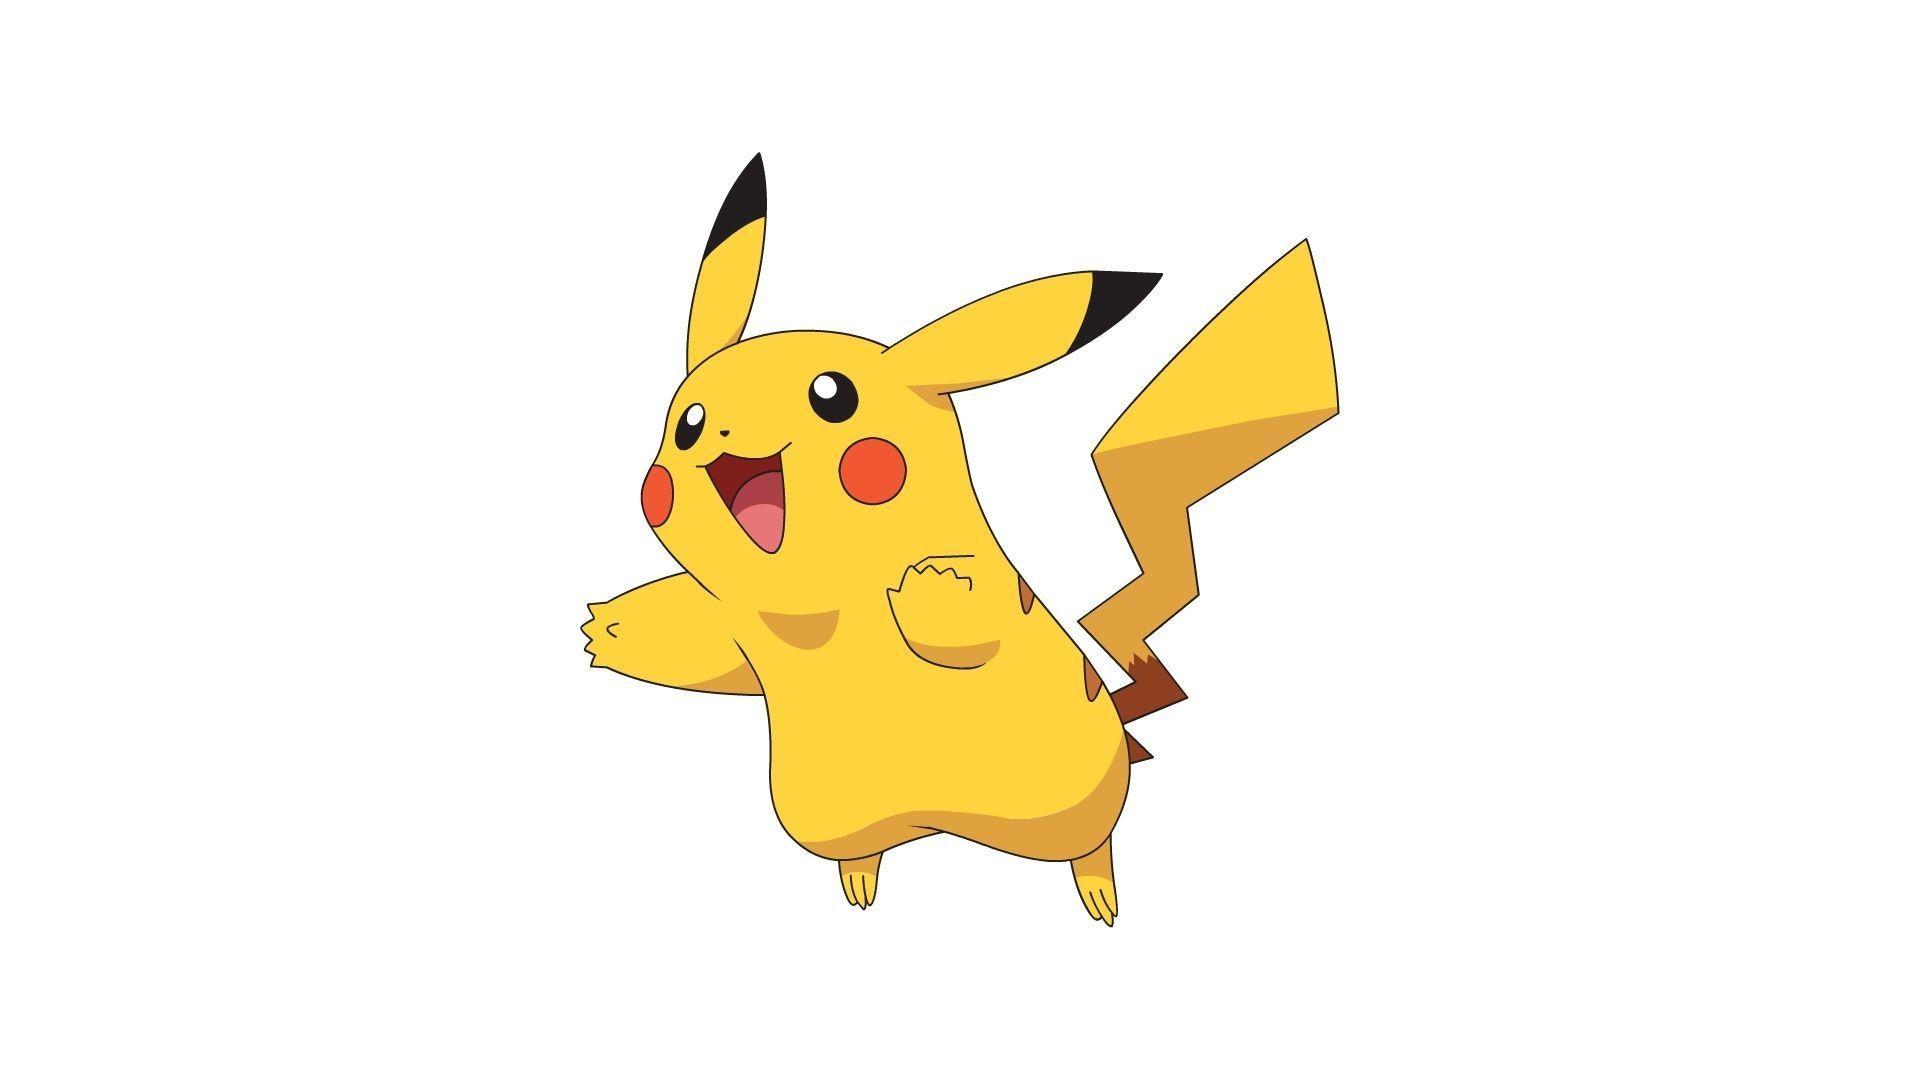 Res: 1920x1080, Cute Pokemon Wallpaper Pikachu Full Hd High Resolution For Desktop